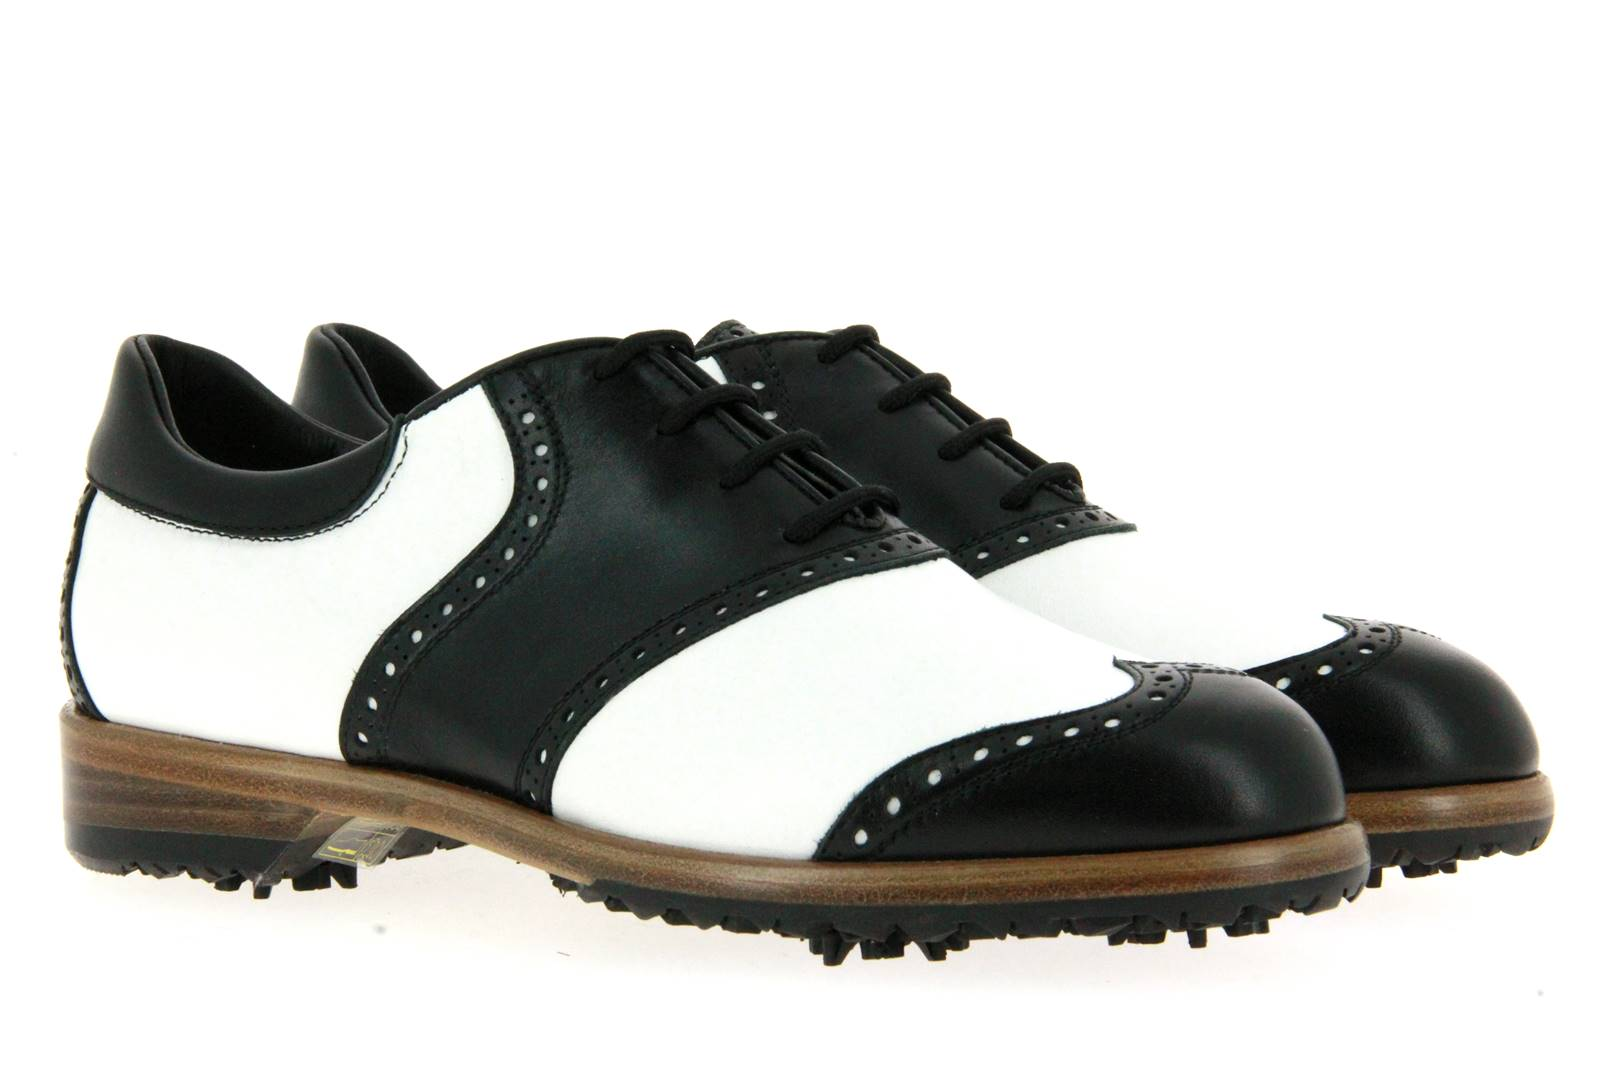 Tee Golf Shoes Damen- Golfschuh SUSY NERO BIANCO (41)